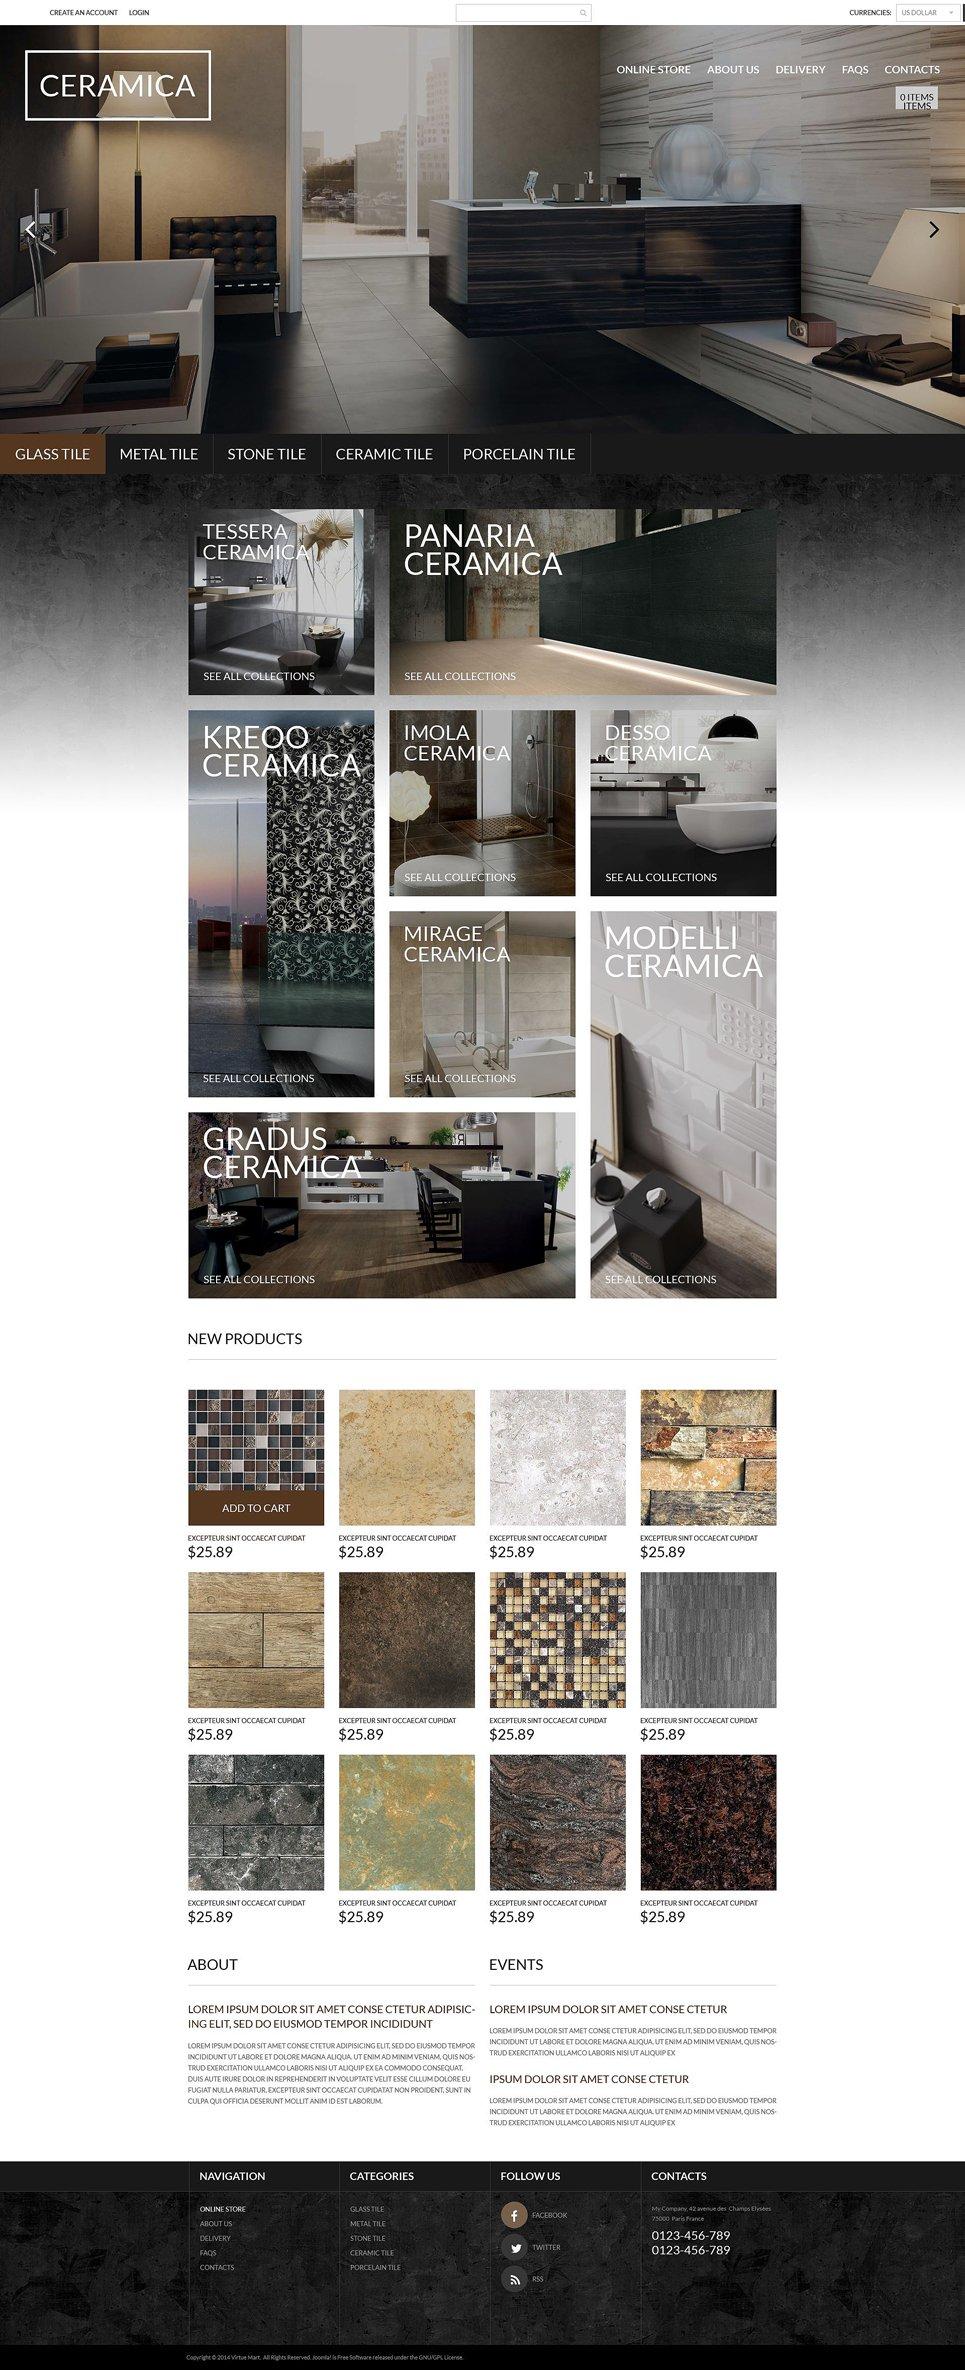 Luxury ceramics virtuemart template 53948 dailygadgetfo Image collections